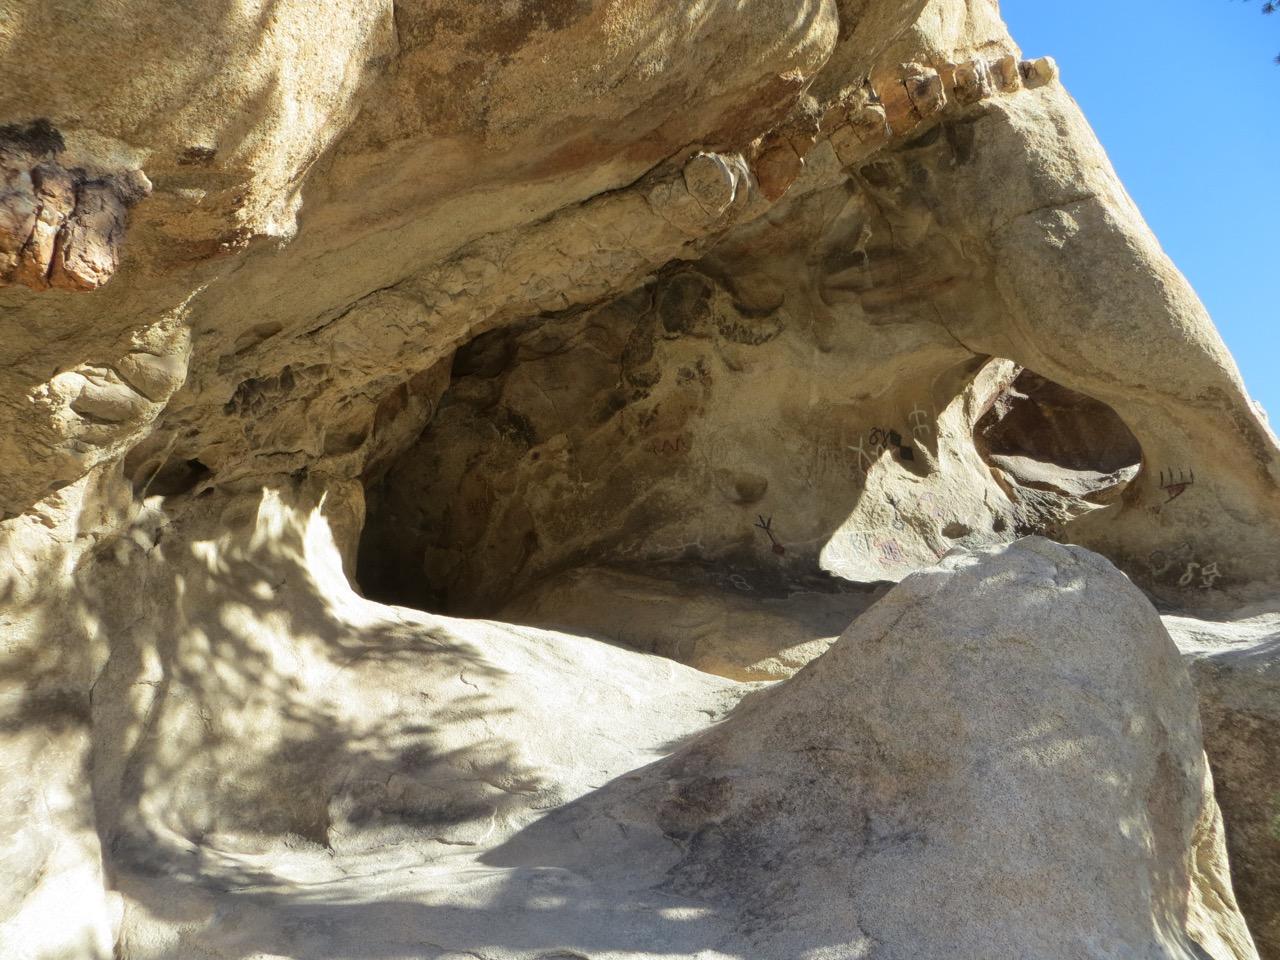 Petroglyphs, Vandalized Petroglyphs, Joshua Tree